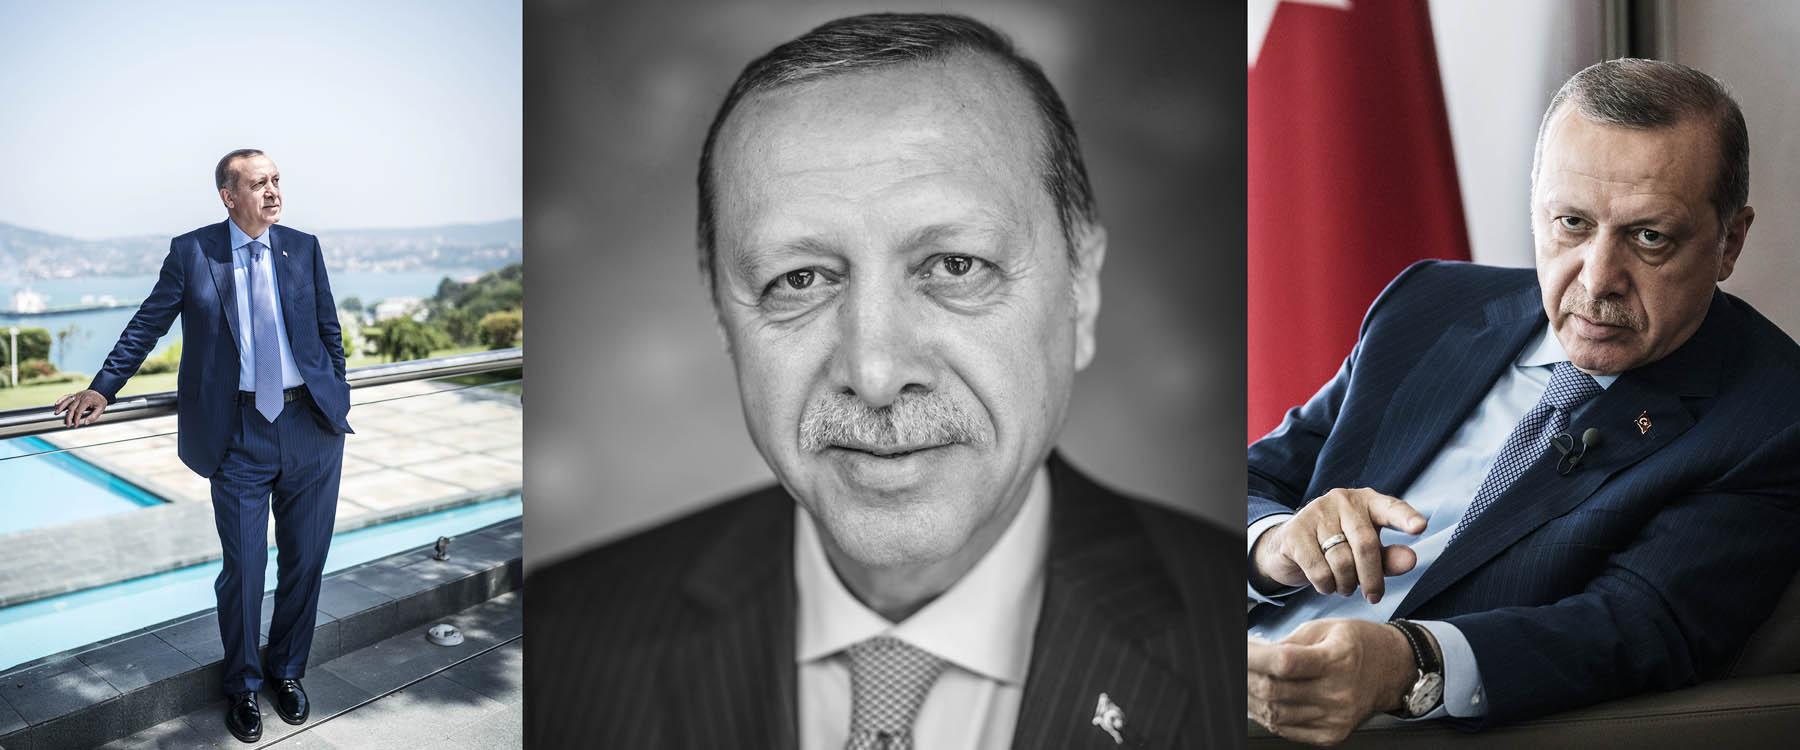 erdogan_slide